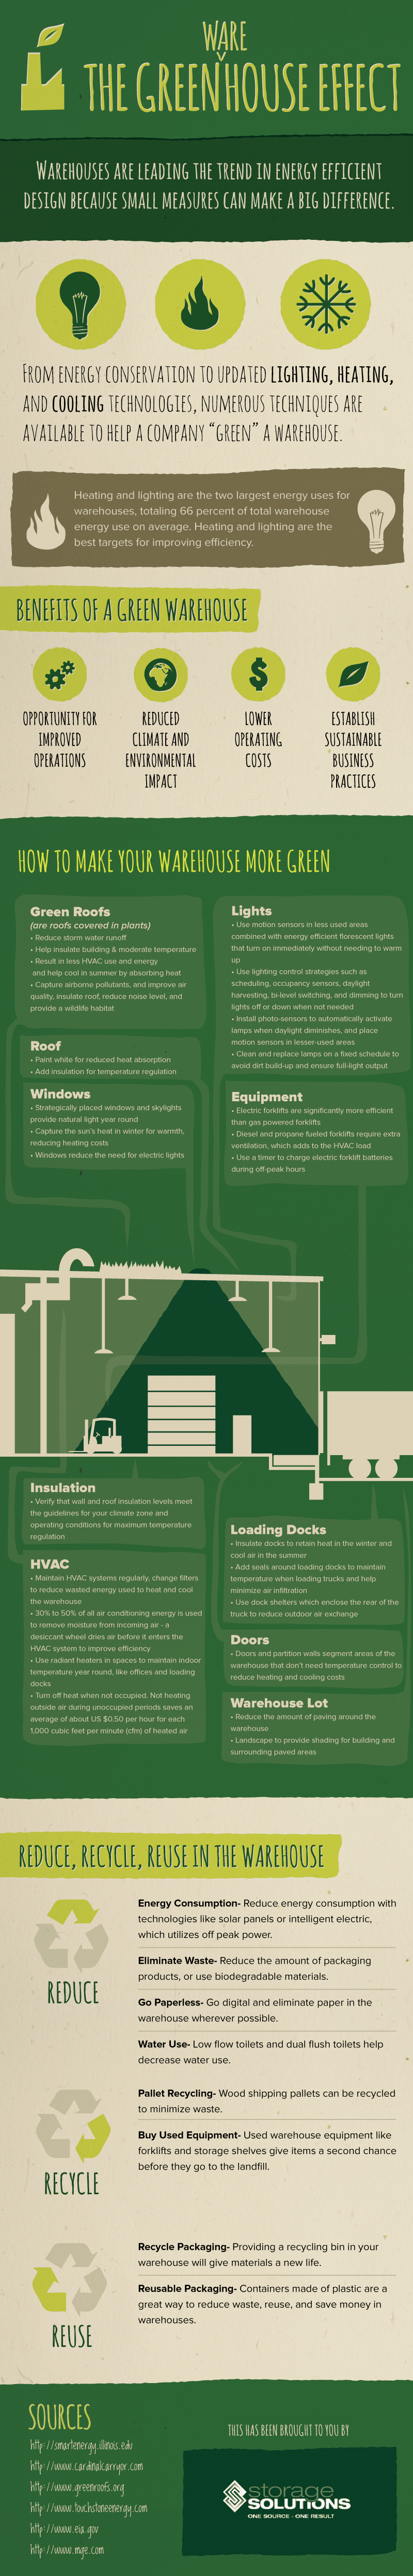 green warehouse effect statistics